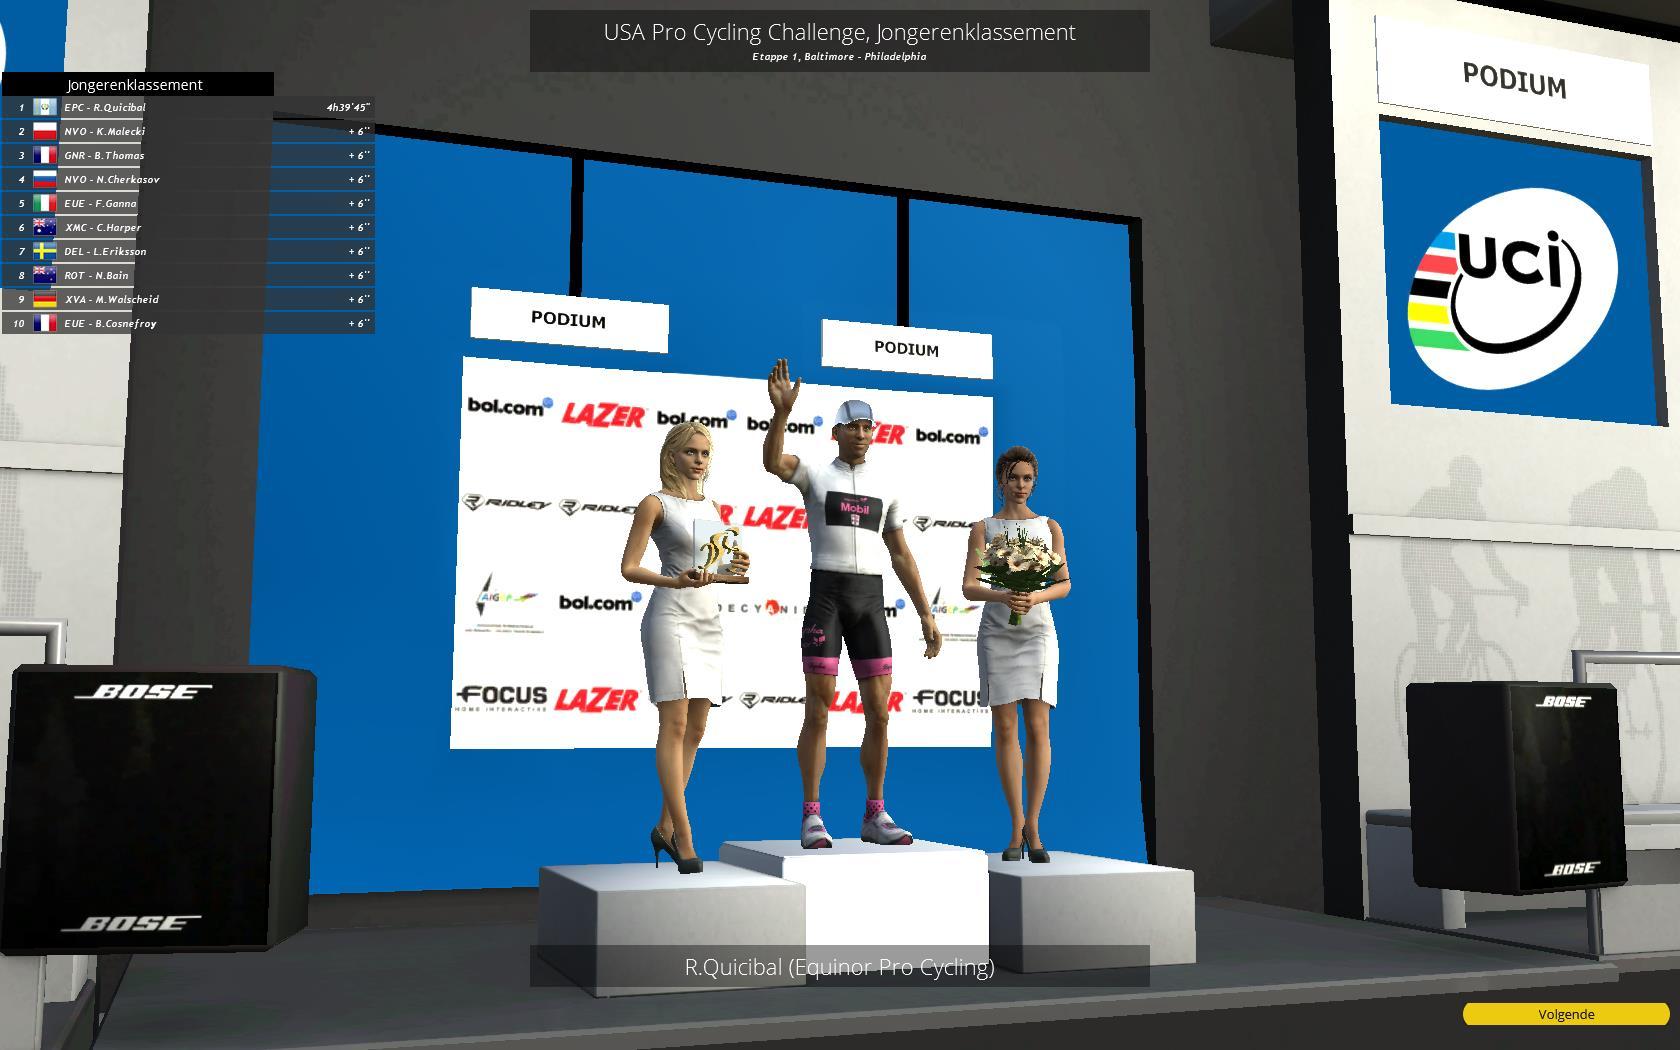 pcmdaily.com/images/mg/2018/Races/C2/USAPCC/1/PCM0020.jpg